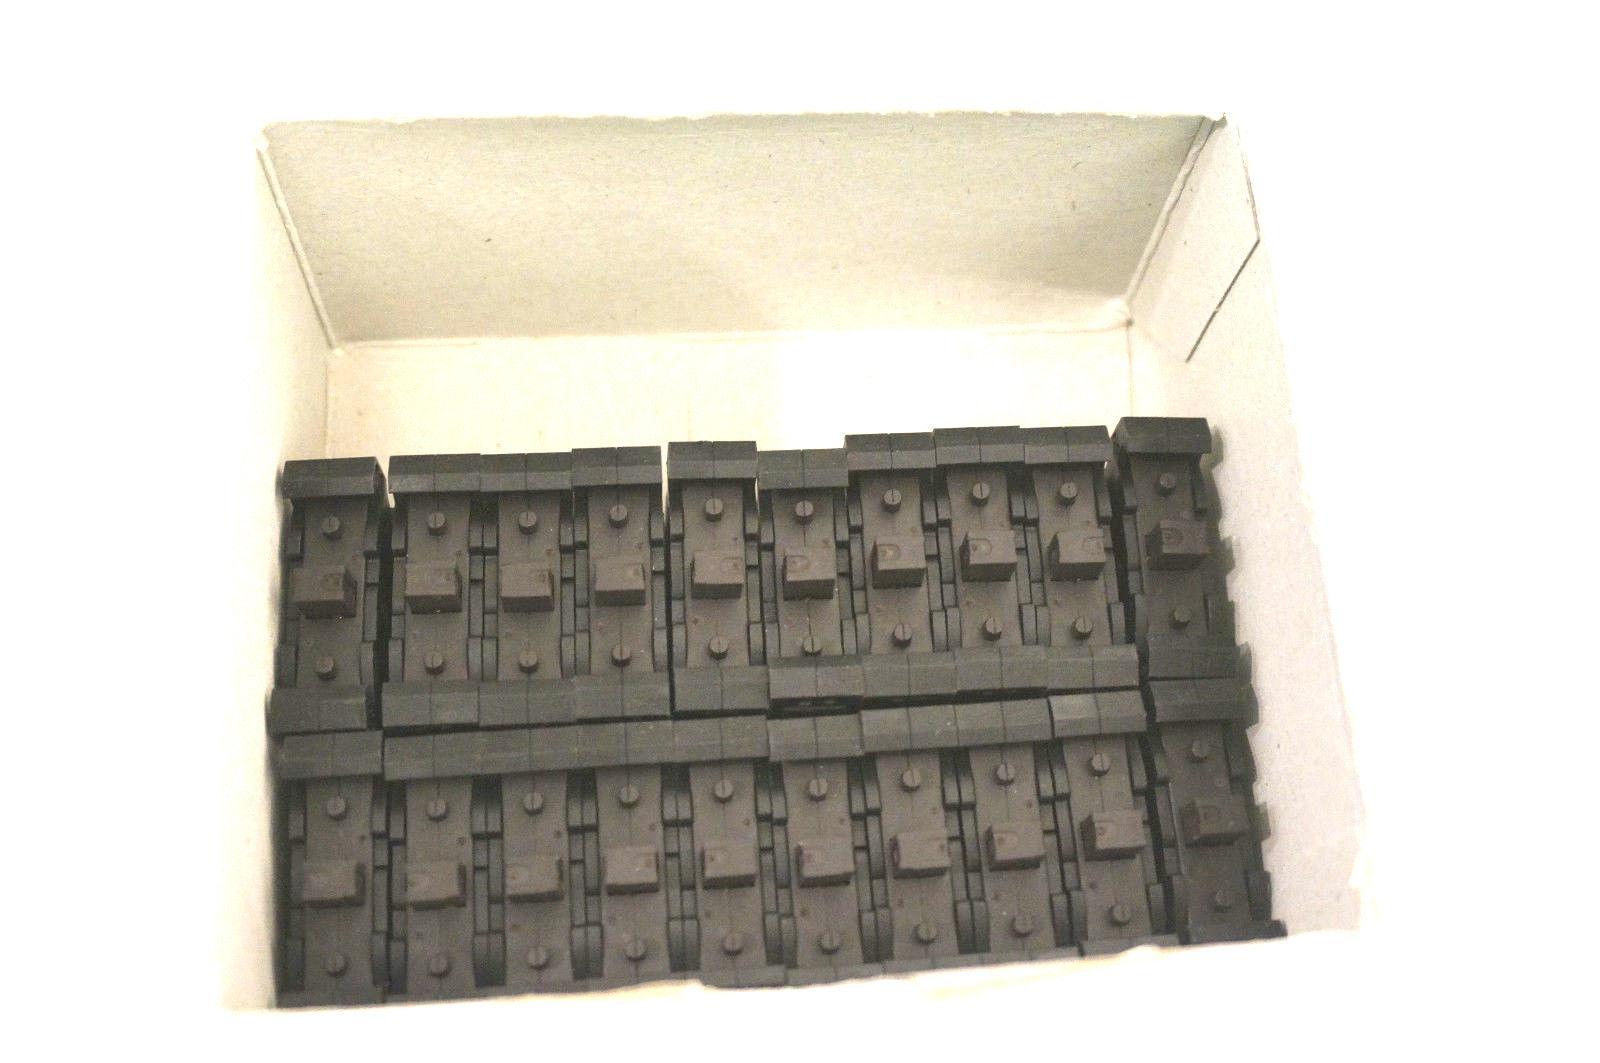 20 NEW SIEMENS 3SB3-403-0B CONTACT BLOCK 3SB34030B